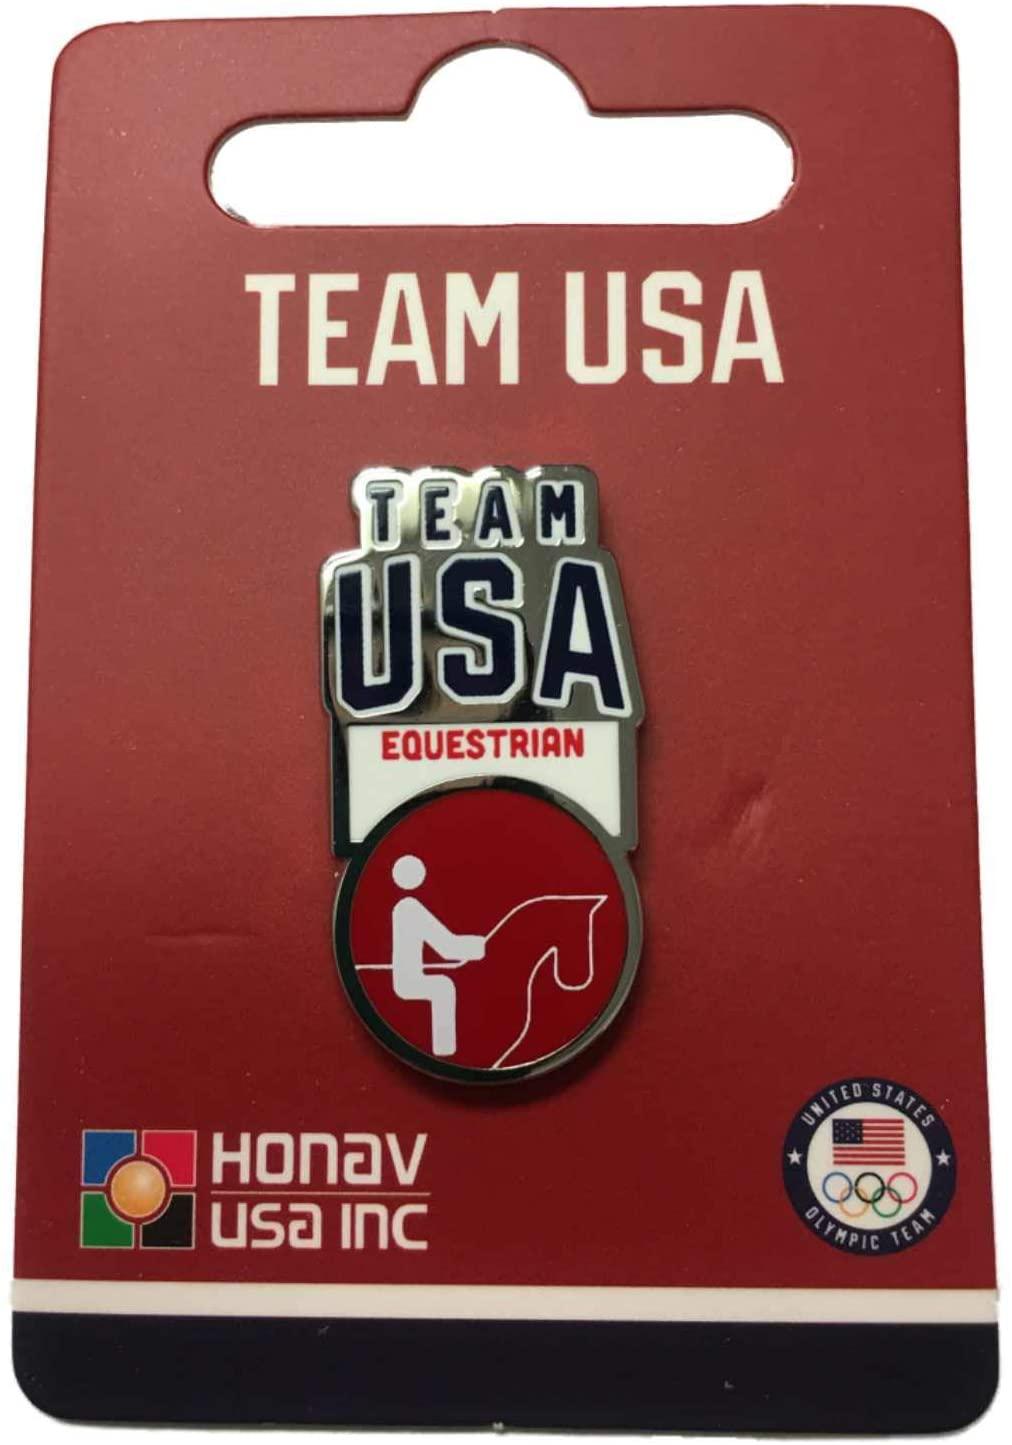 2020 Summer Olympics Tokyo Japan Team USA Equestrian Pictogram Metal Lapel Pin